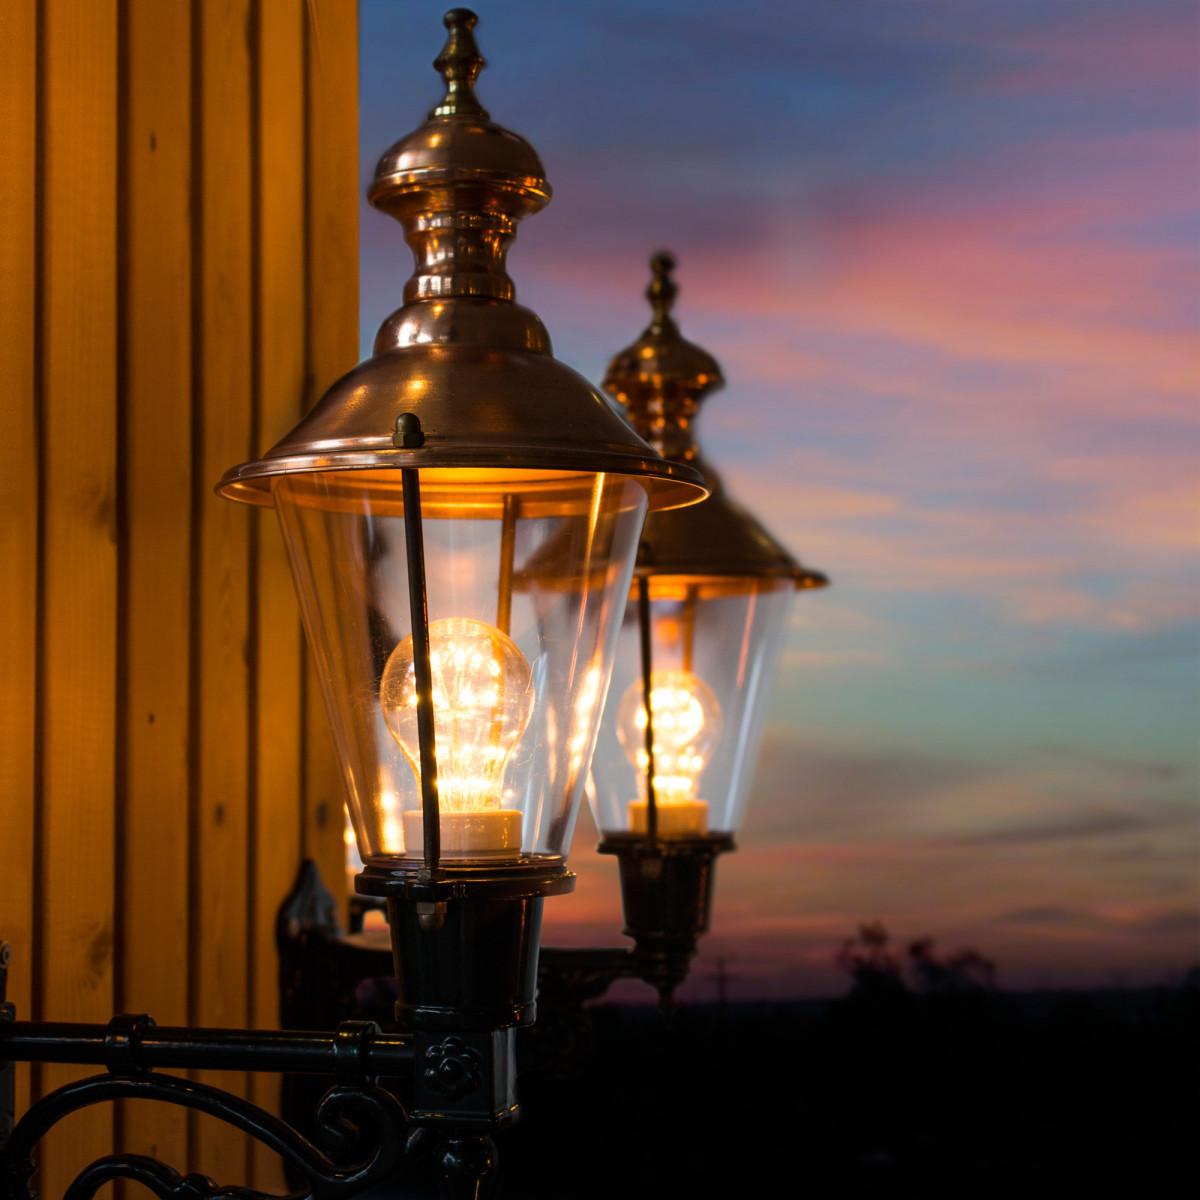 Buitenlamp Edam Dag Nacht sensor LED Schemersensor